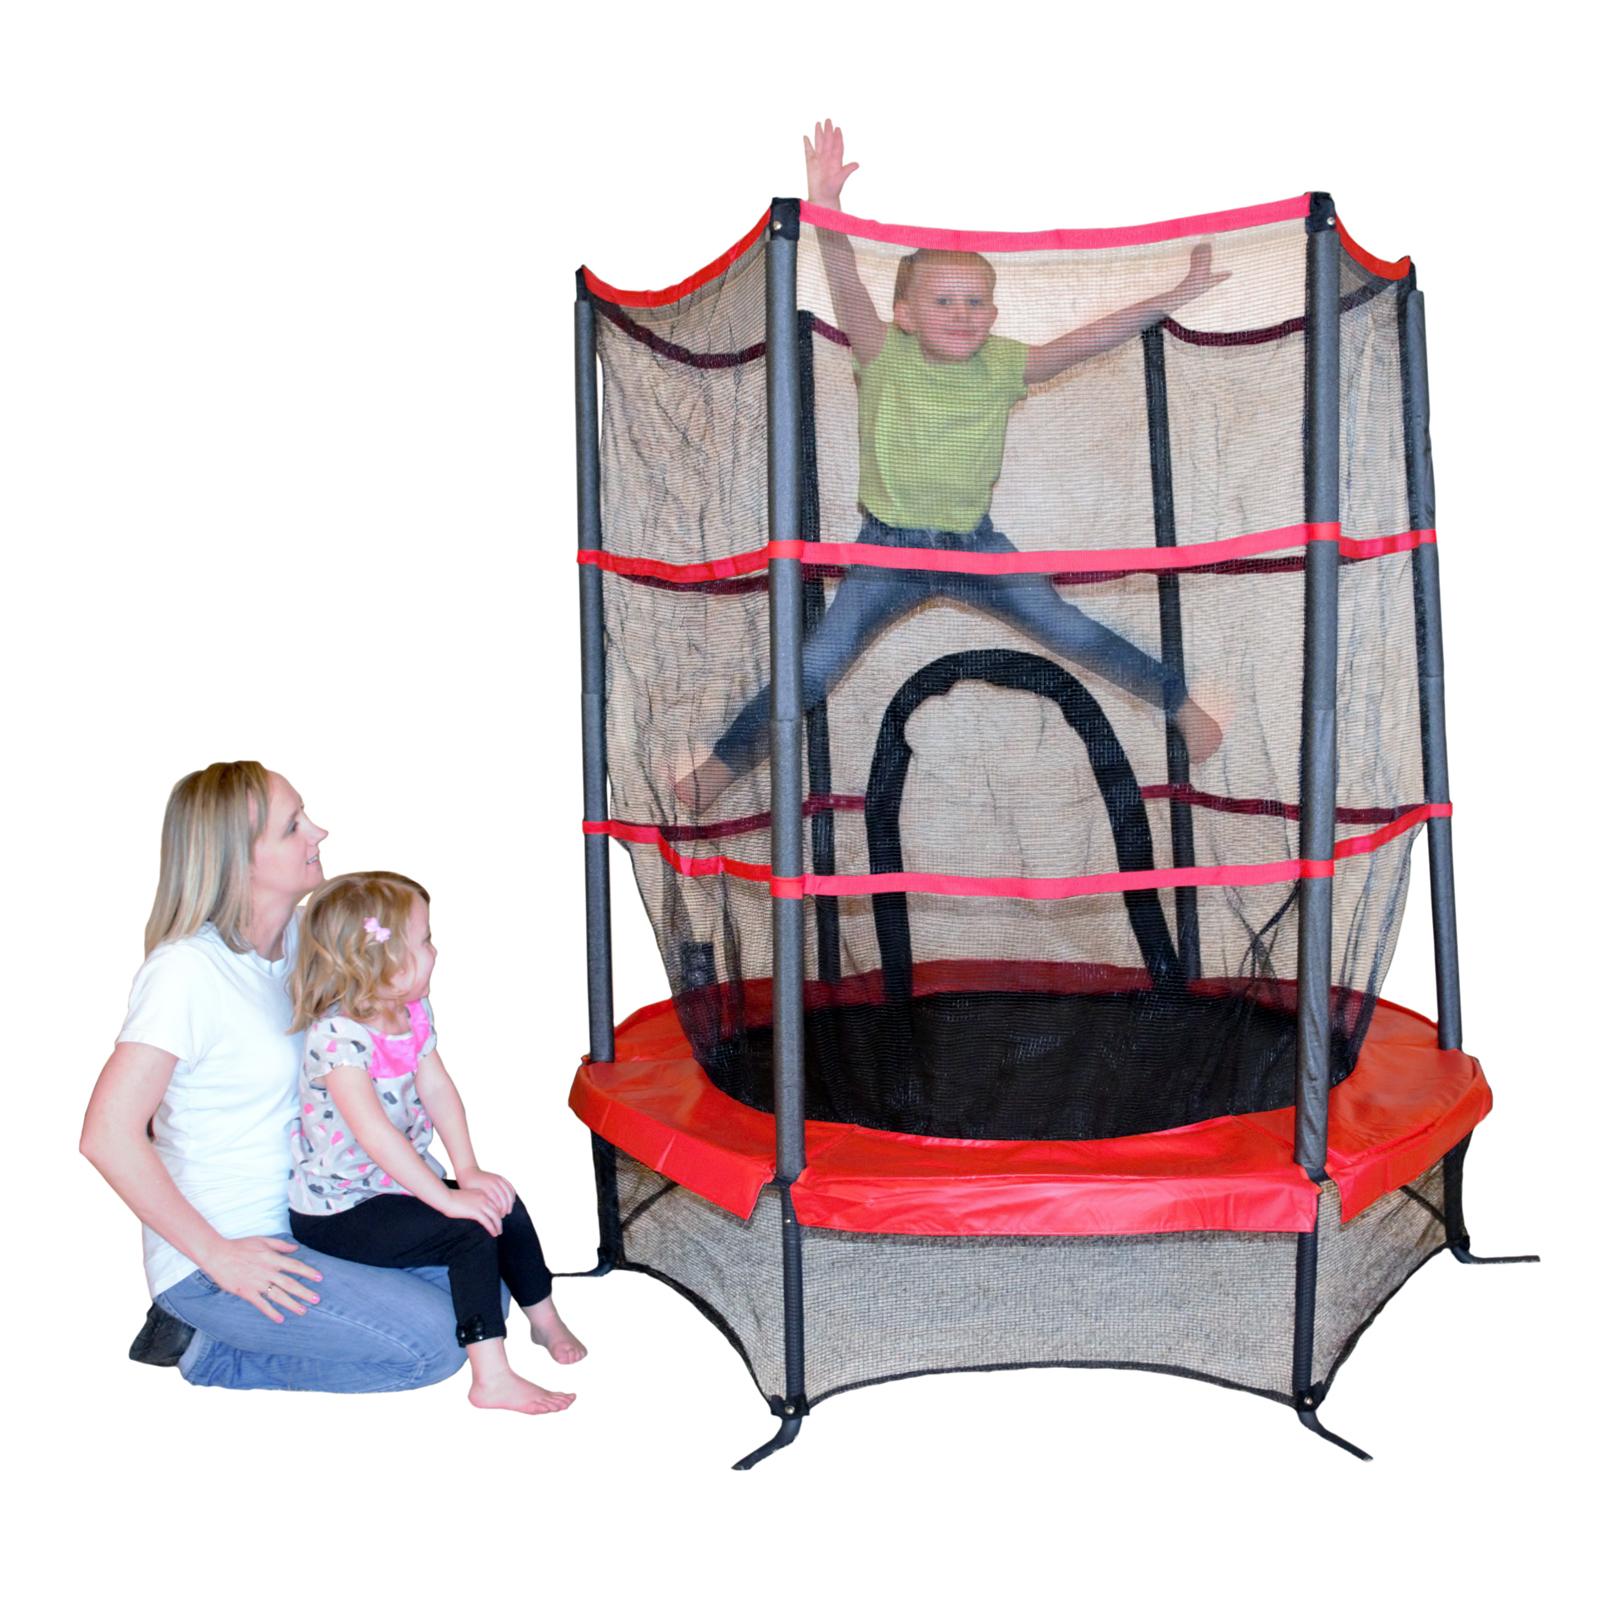 Propel Trampolines Preschool Enclosed Small Trampoline